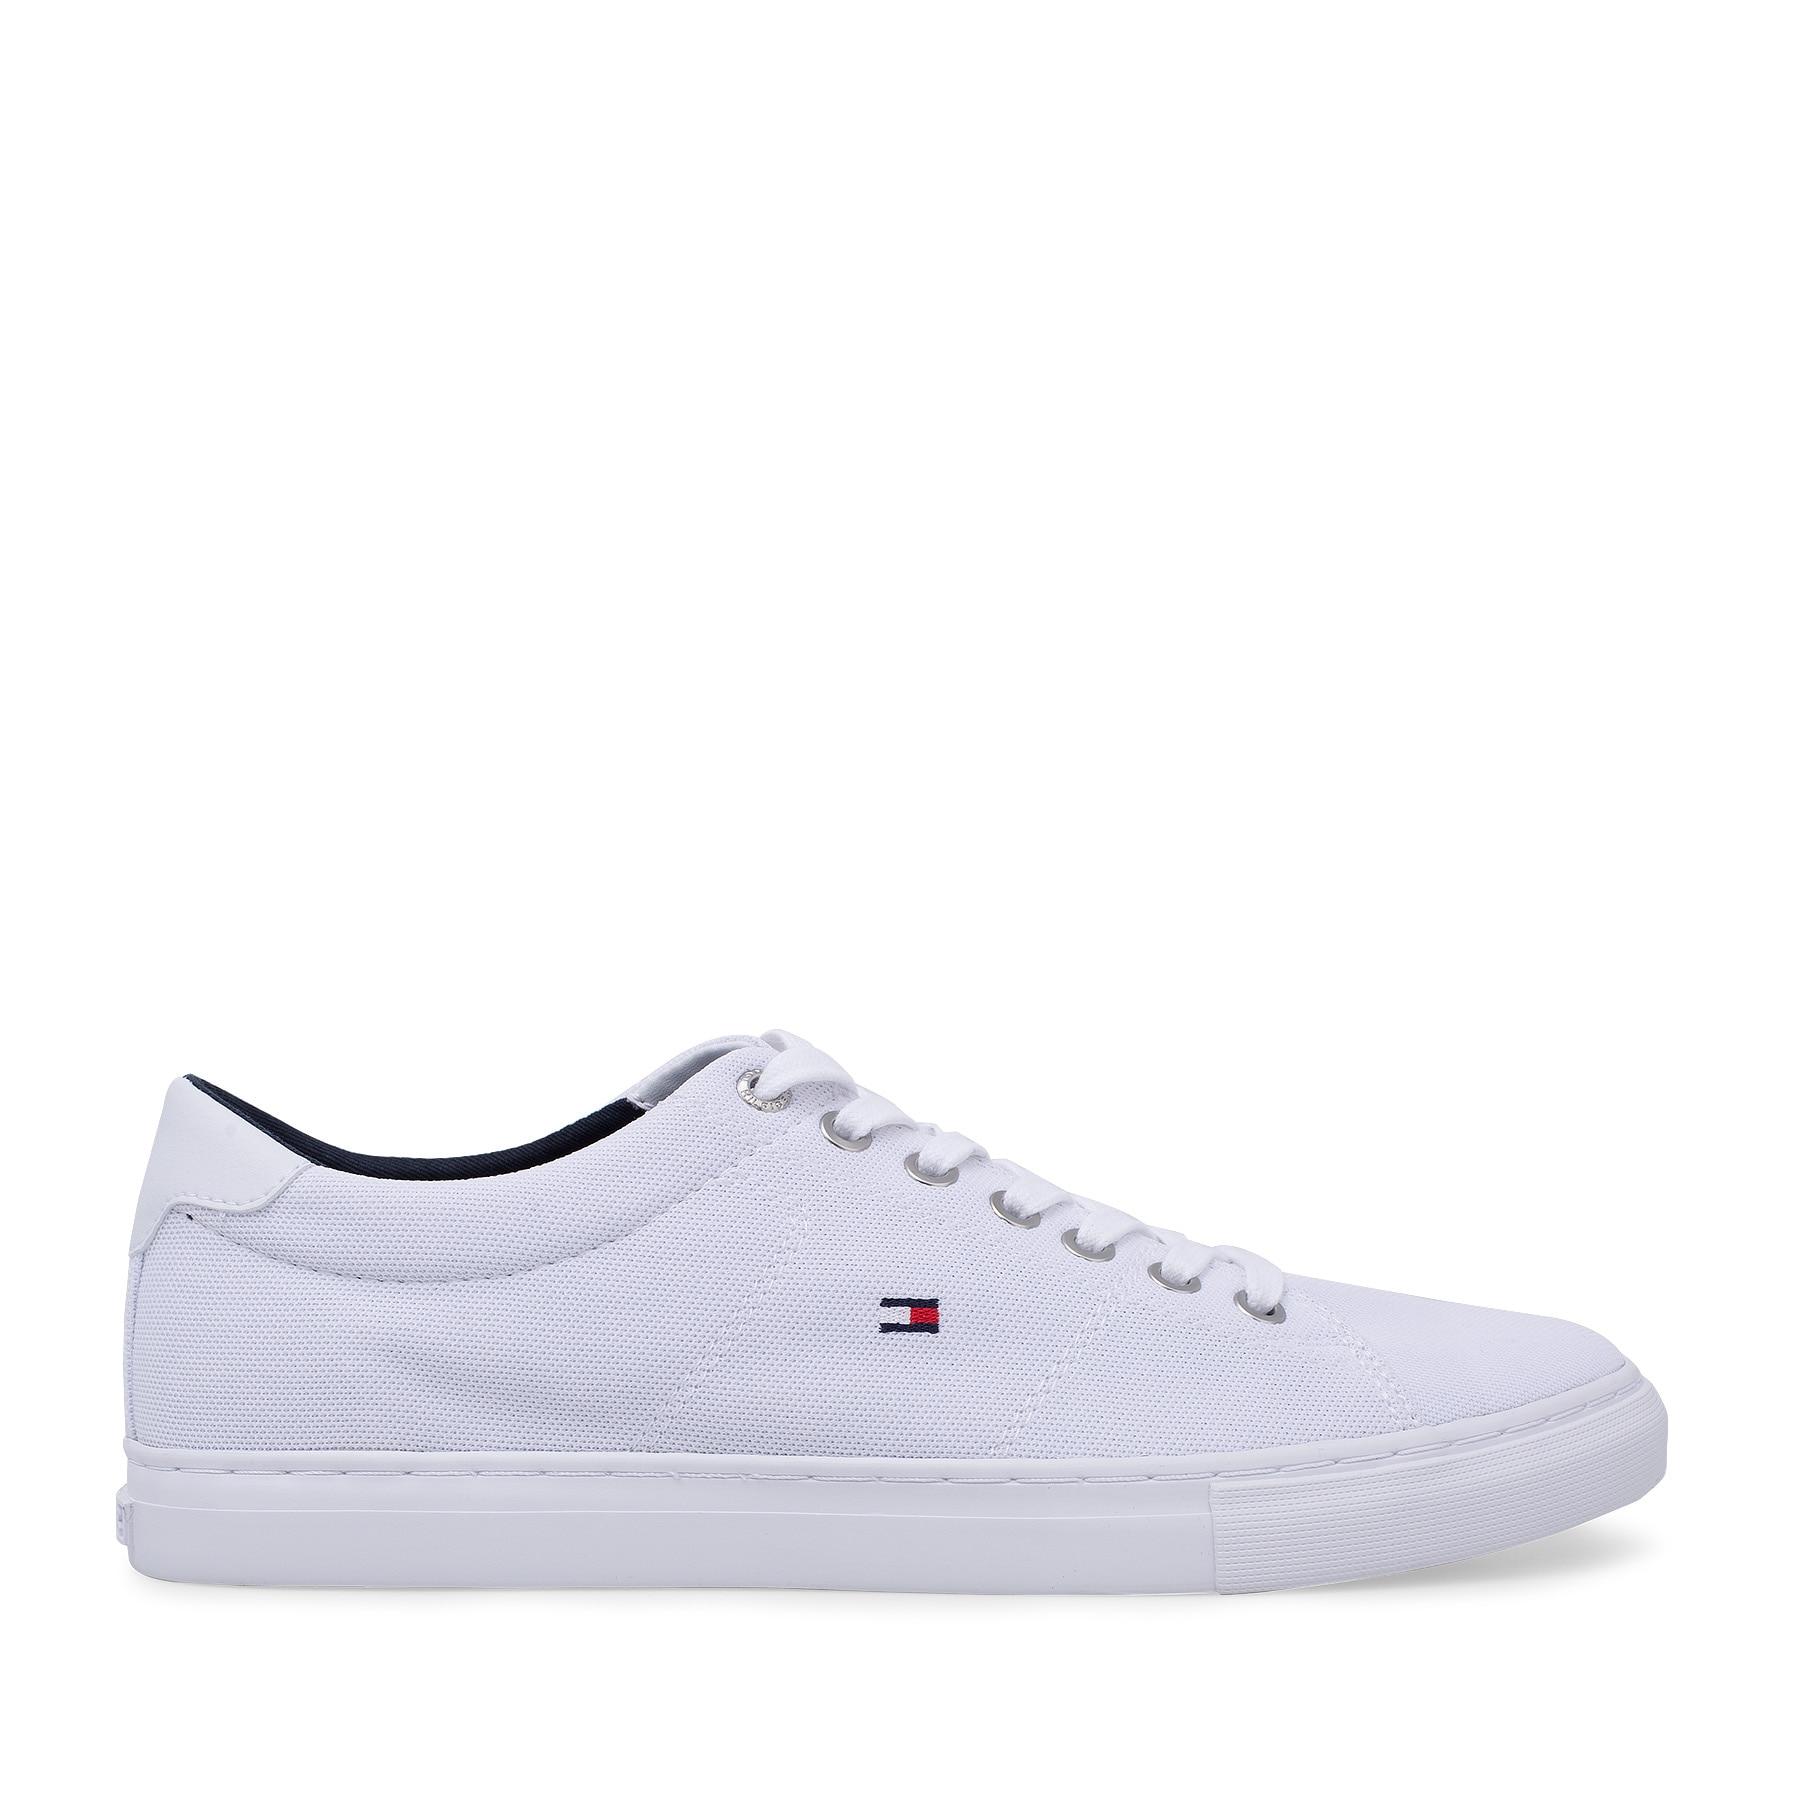 Tommy Hilfiger Shoes MALE SHOES FM0FM02687 YBS